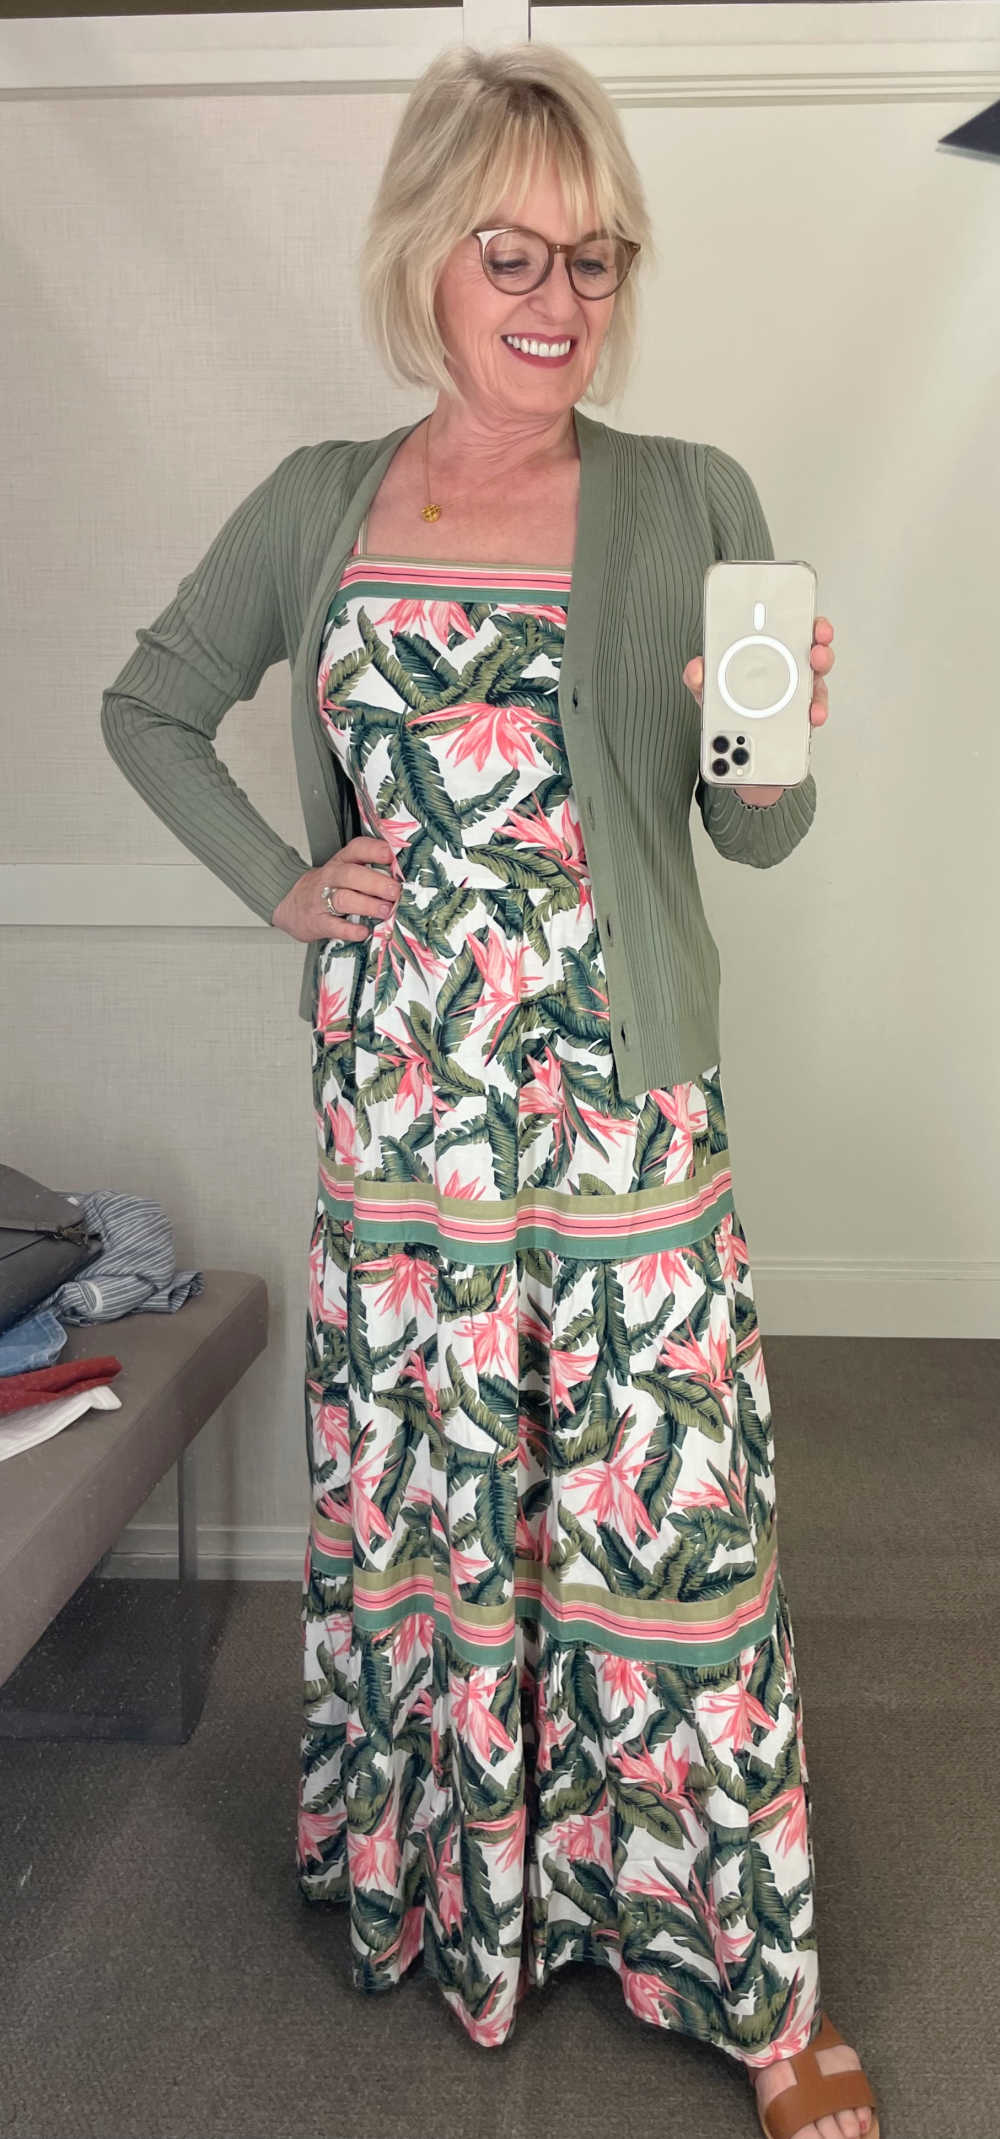 woman taking selfie in Loft dressing room mirror wearing dress with tropical print